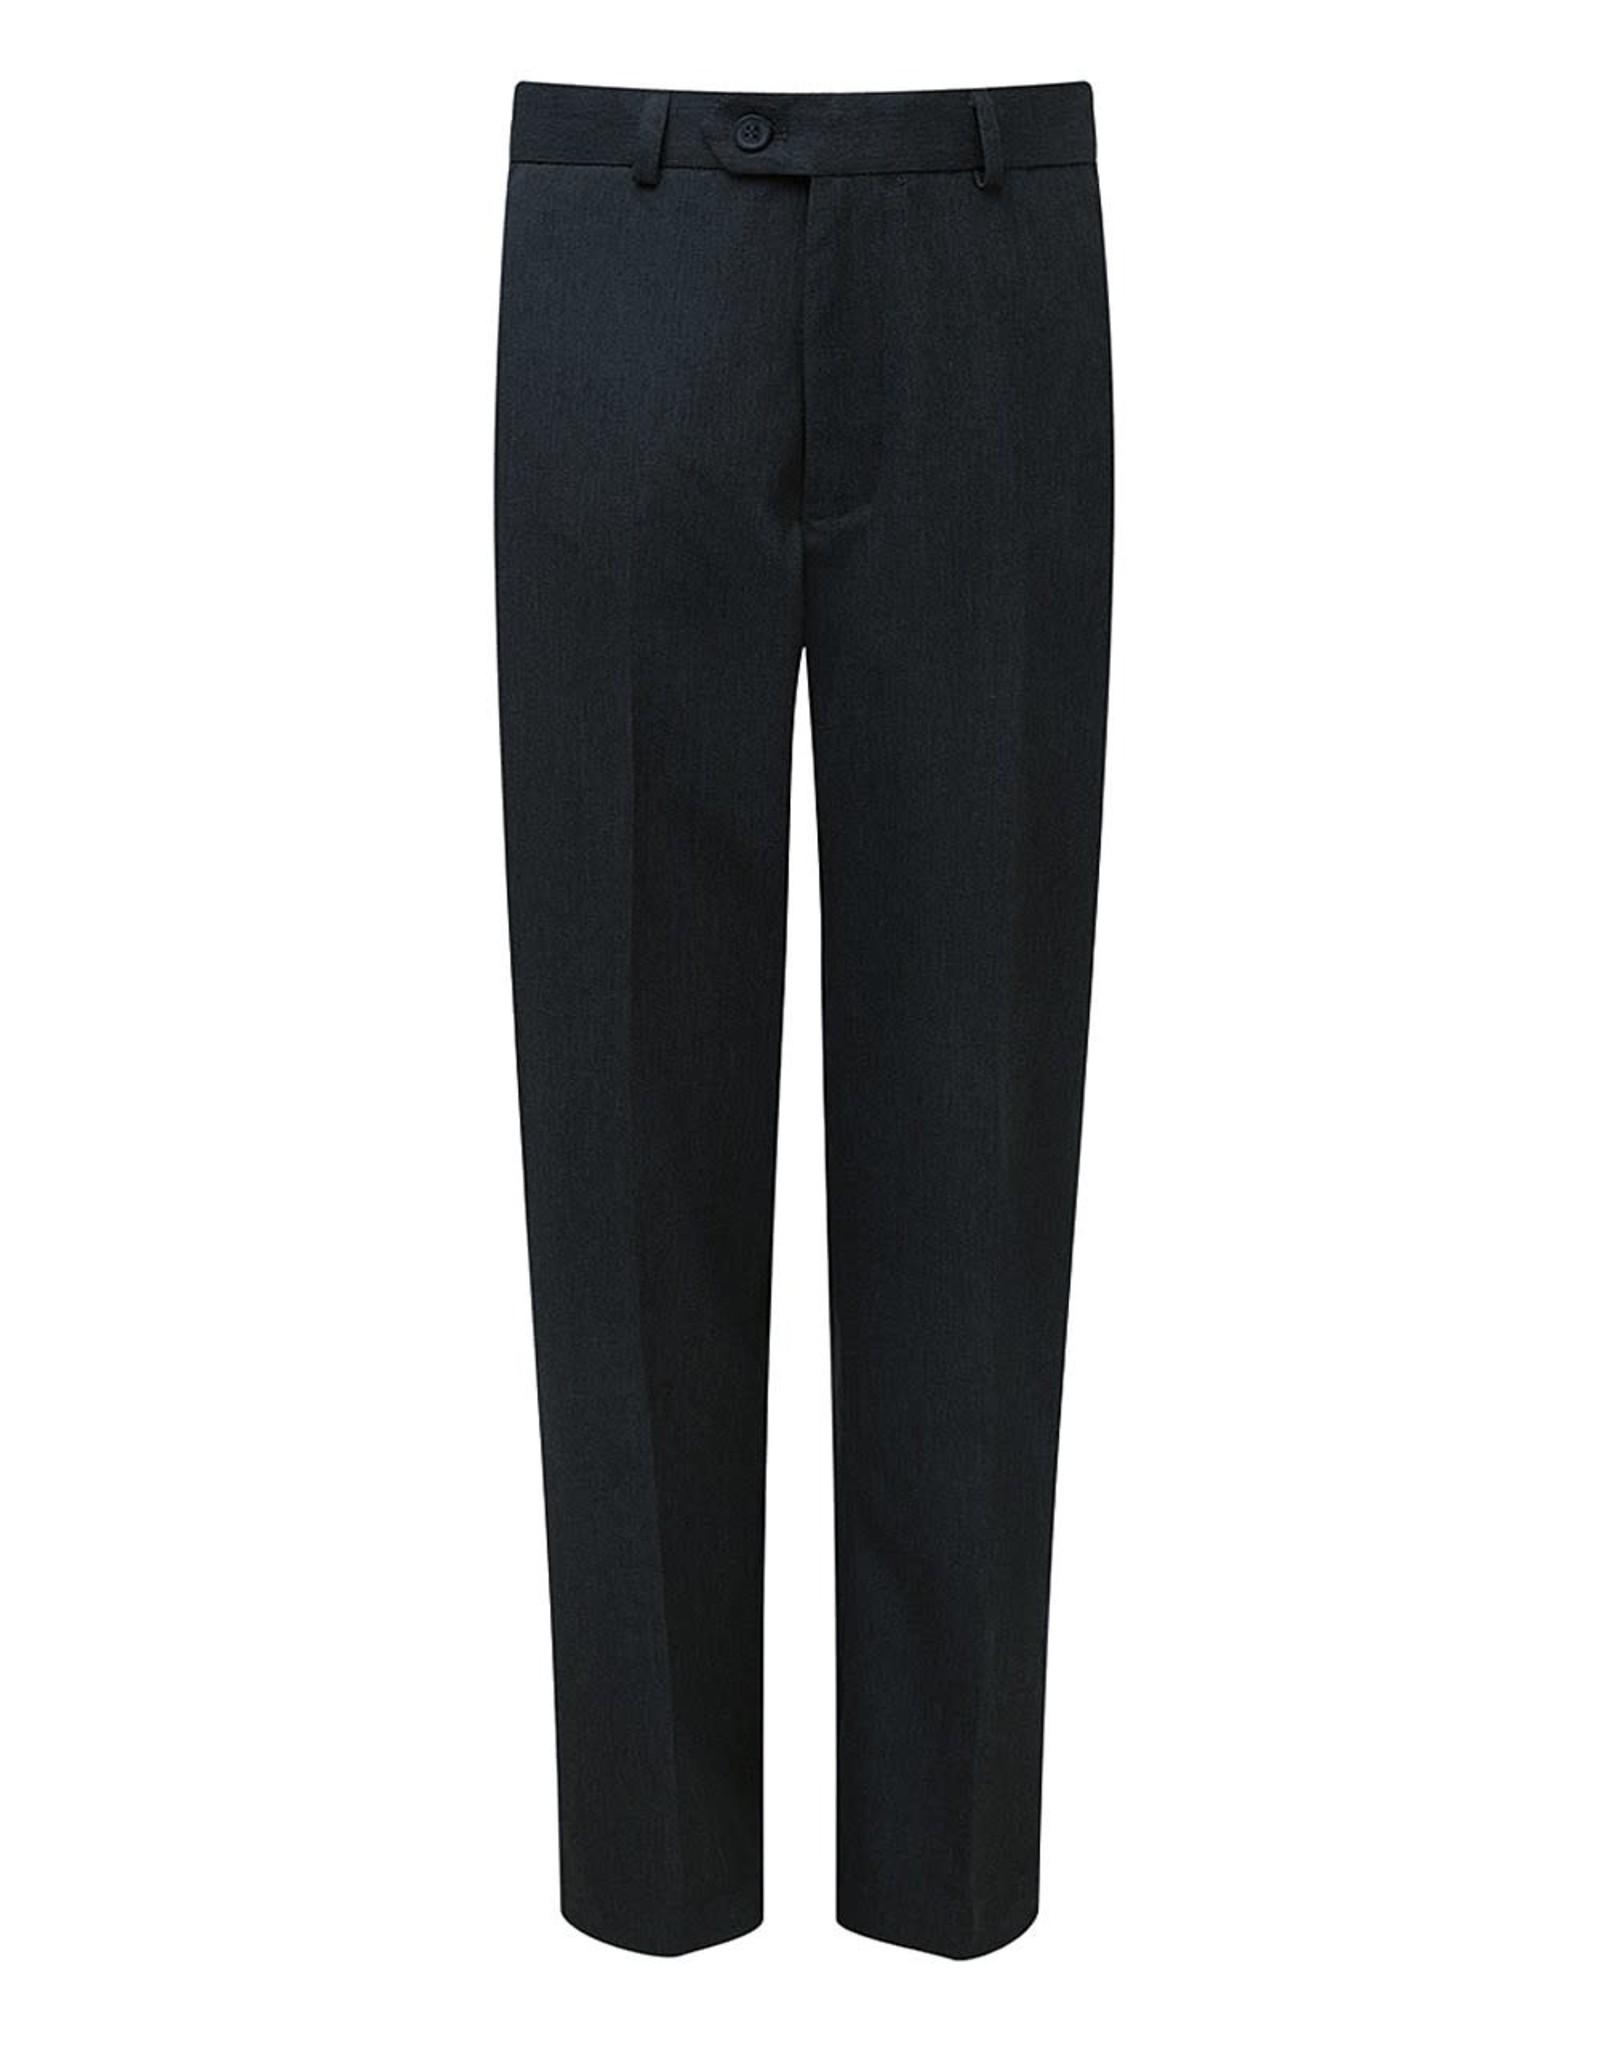 ASPIRE Boys Aspire Flat Front Trousers Adult Size - Nicholas Chamberlaine School